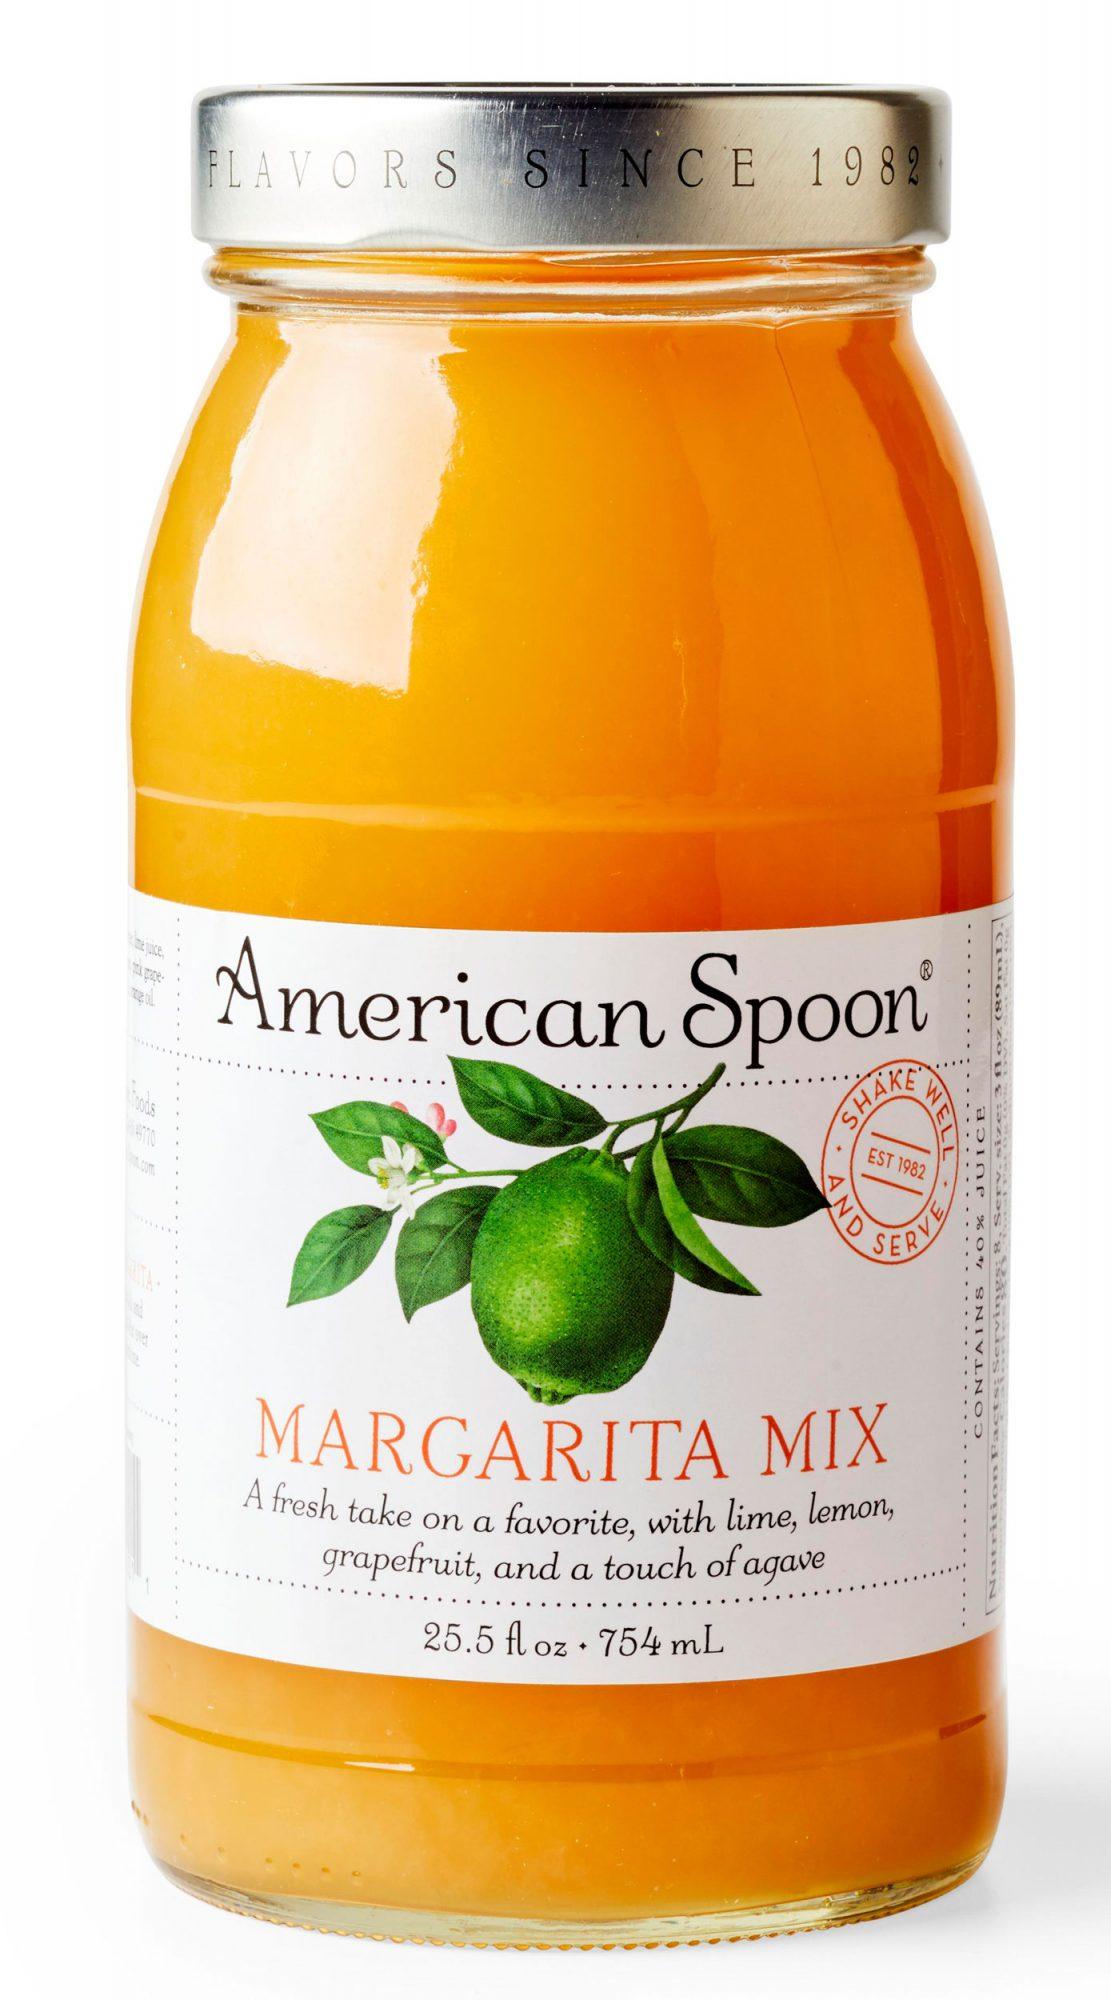 American Spoon Margarita Mix